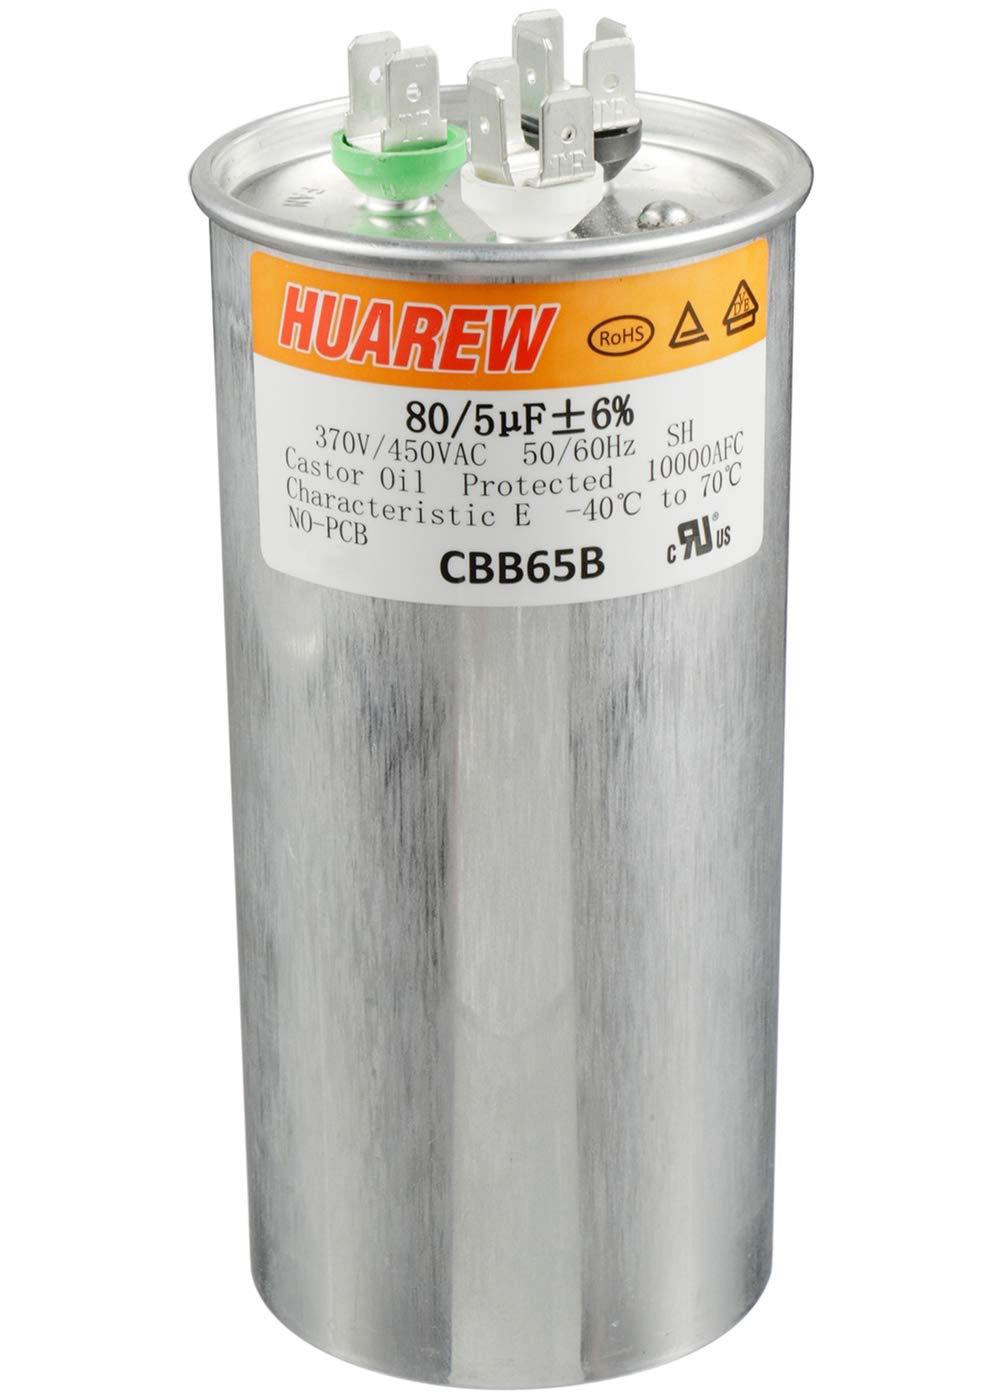 HUAREW 80+5 uF ±6% 80/5 MFD 370/450 VAC CBB65 Dual Run Start